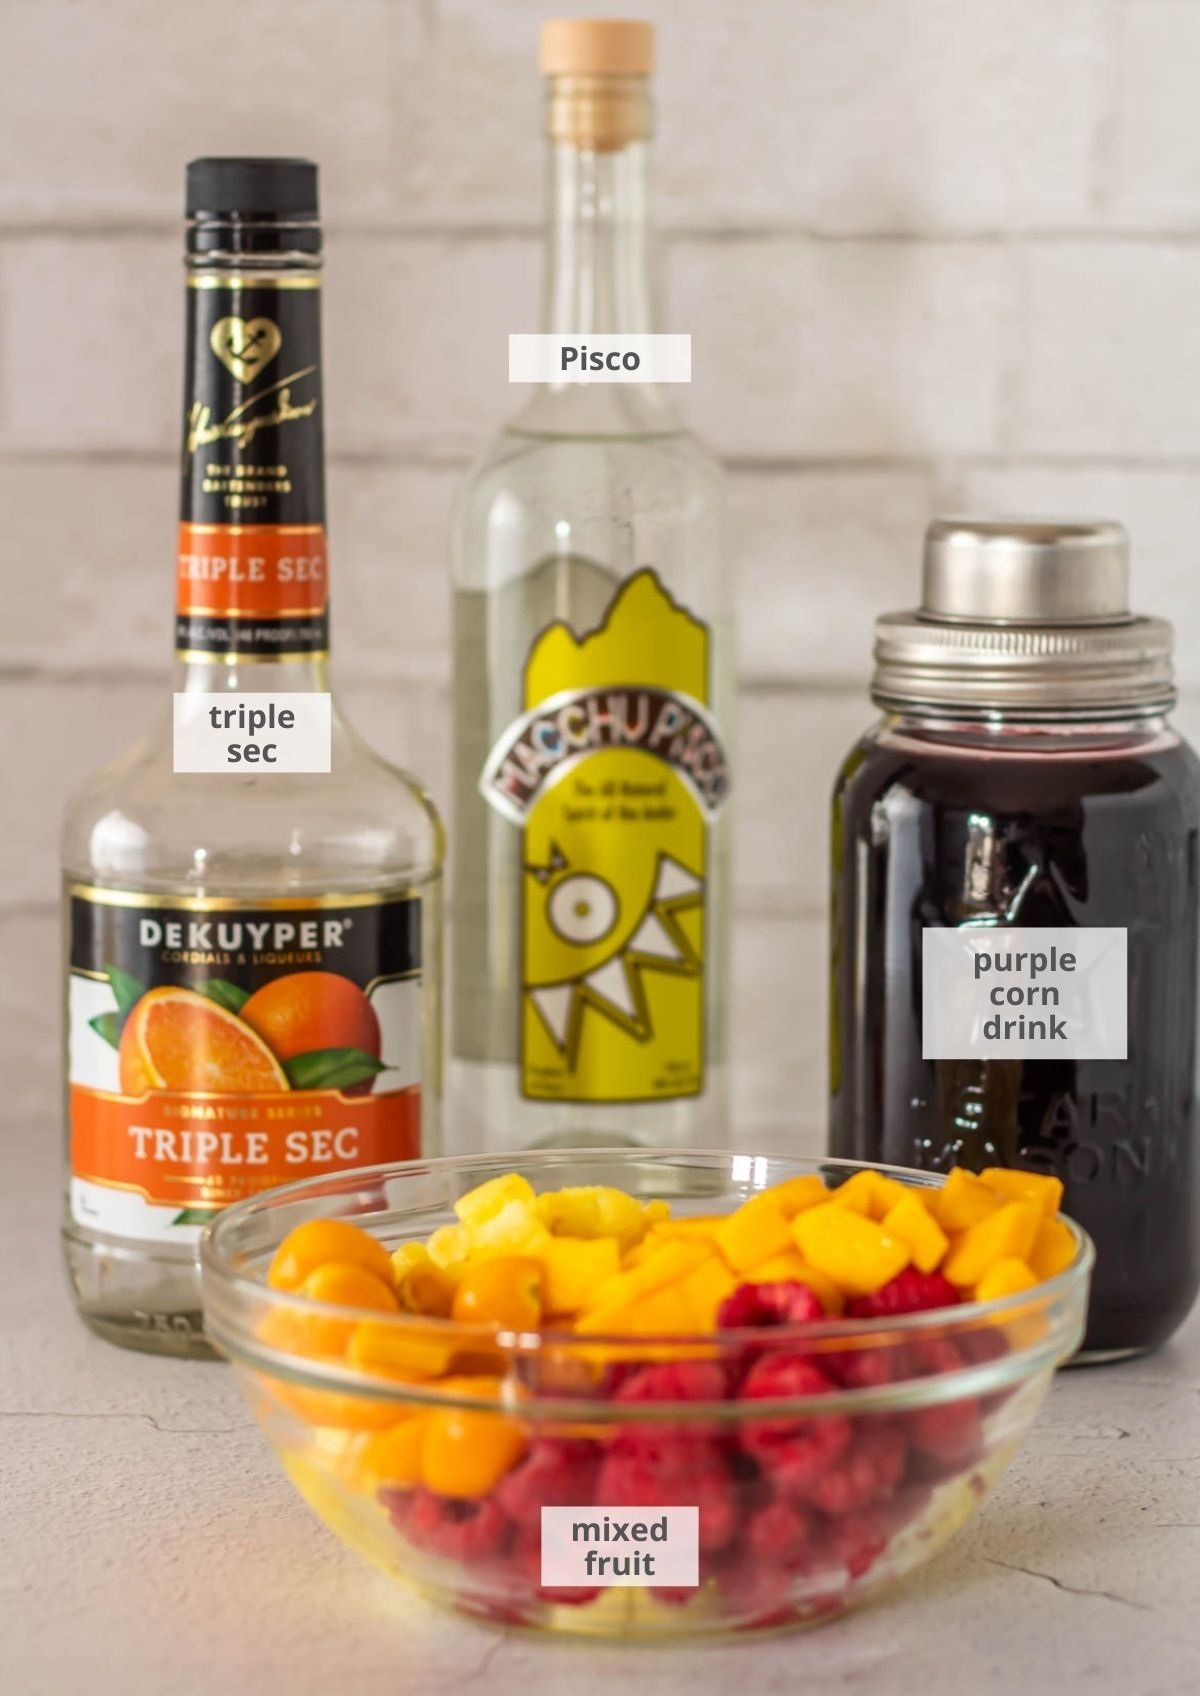 Ingredients for the Peruvian sangria: Orange liqueur, Pisco, chicha morada (purple corn drink), and mixed fruit.